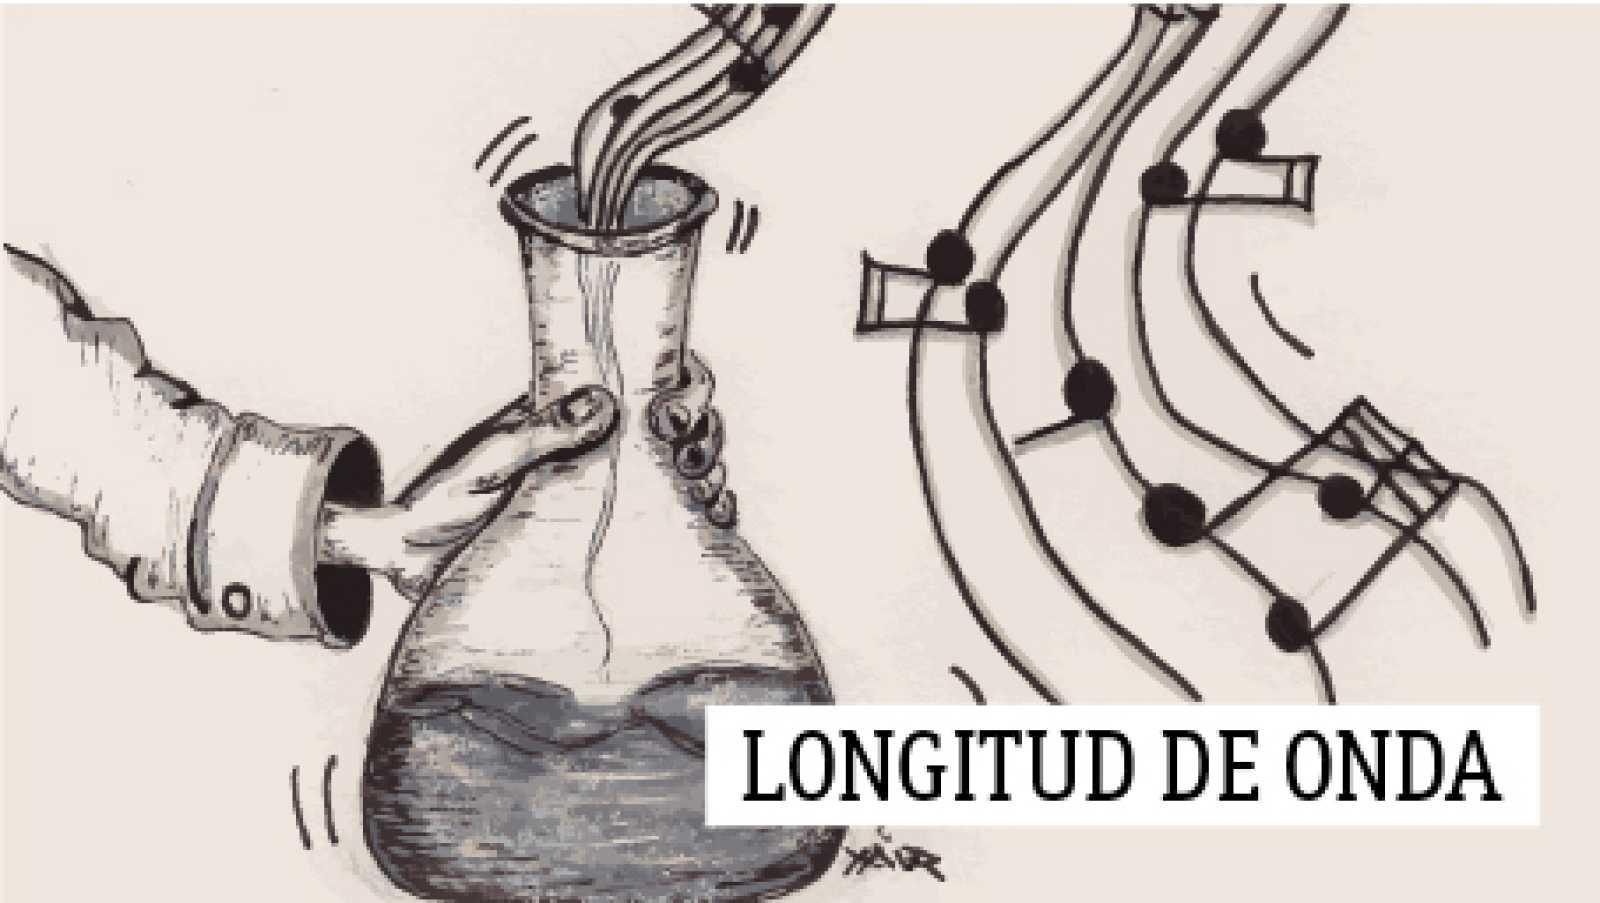 Longitud de onda - Arqueoacústica: arqueología musical en China - 25/01/19 - escuchar ahora